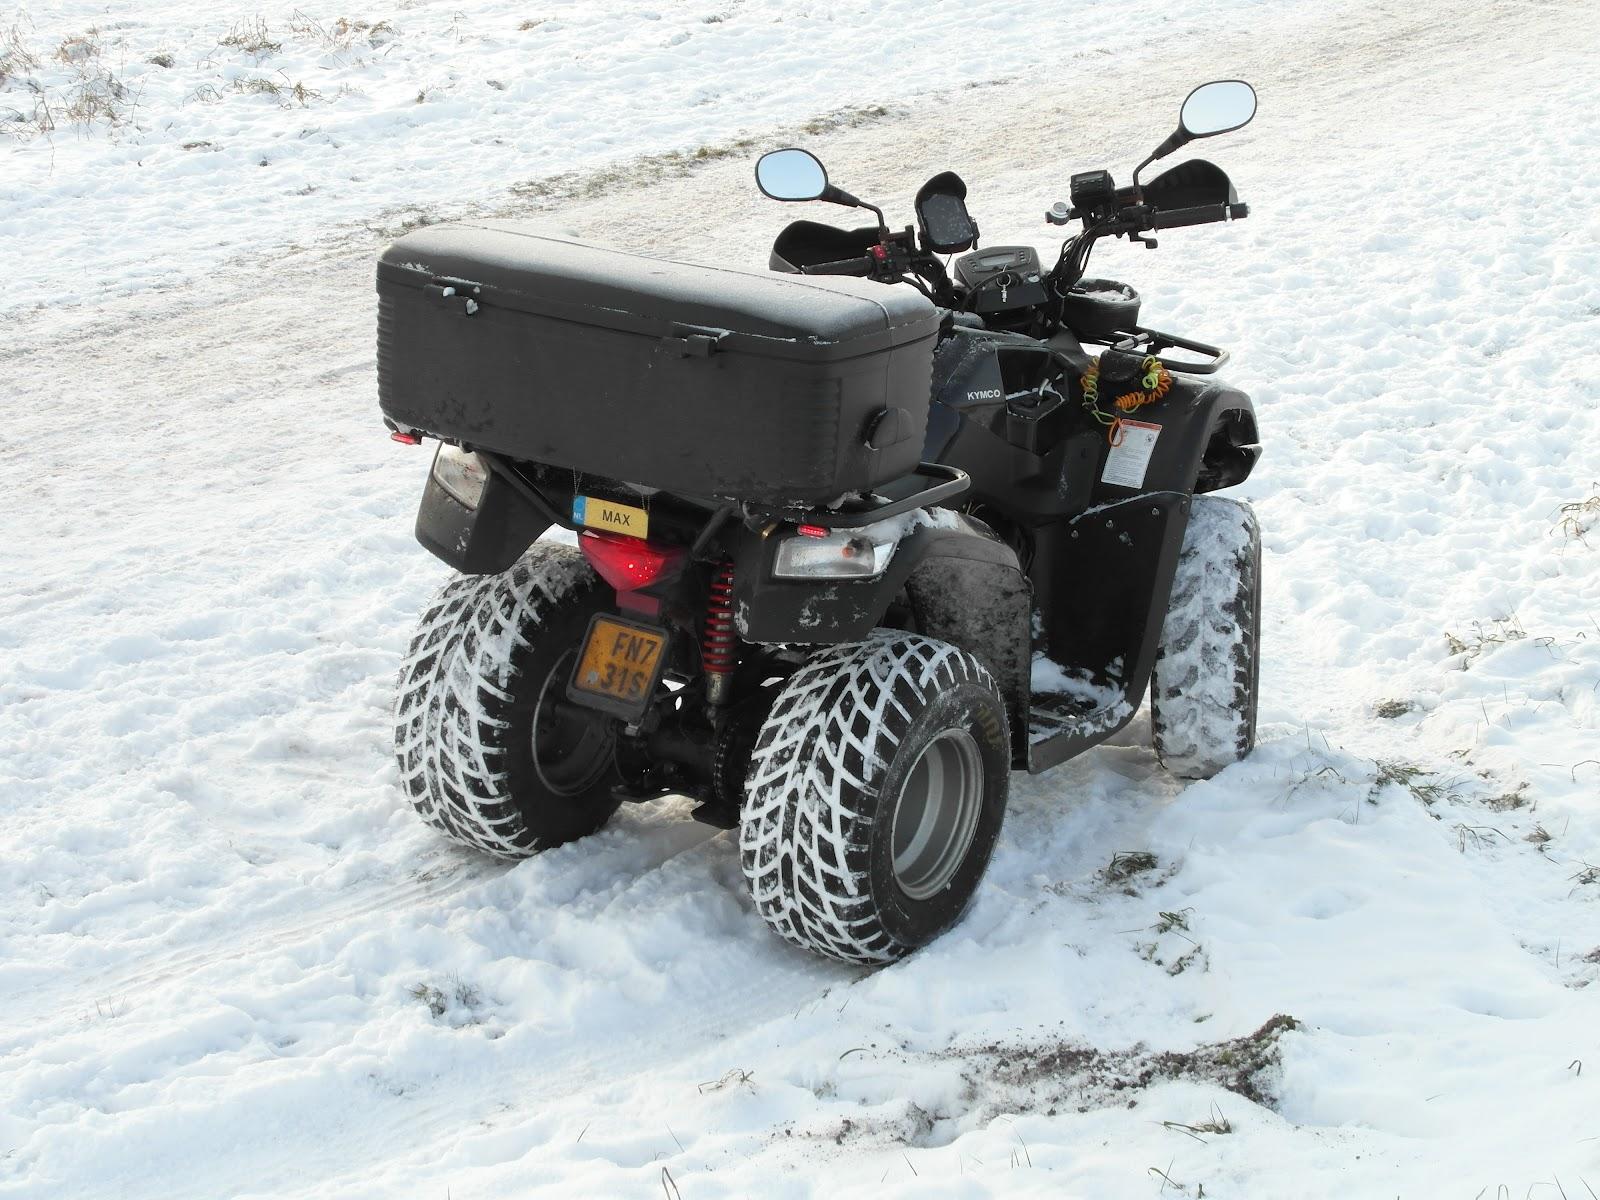 kymco mxu 50cc quad kymco quad mxu 50cc in de sneeuw. Black Bedroom Furniture Sets. Home Design Ideas